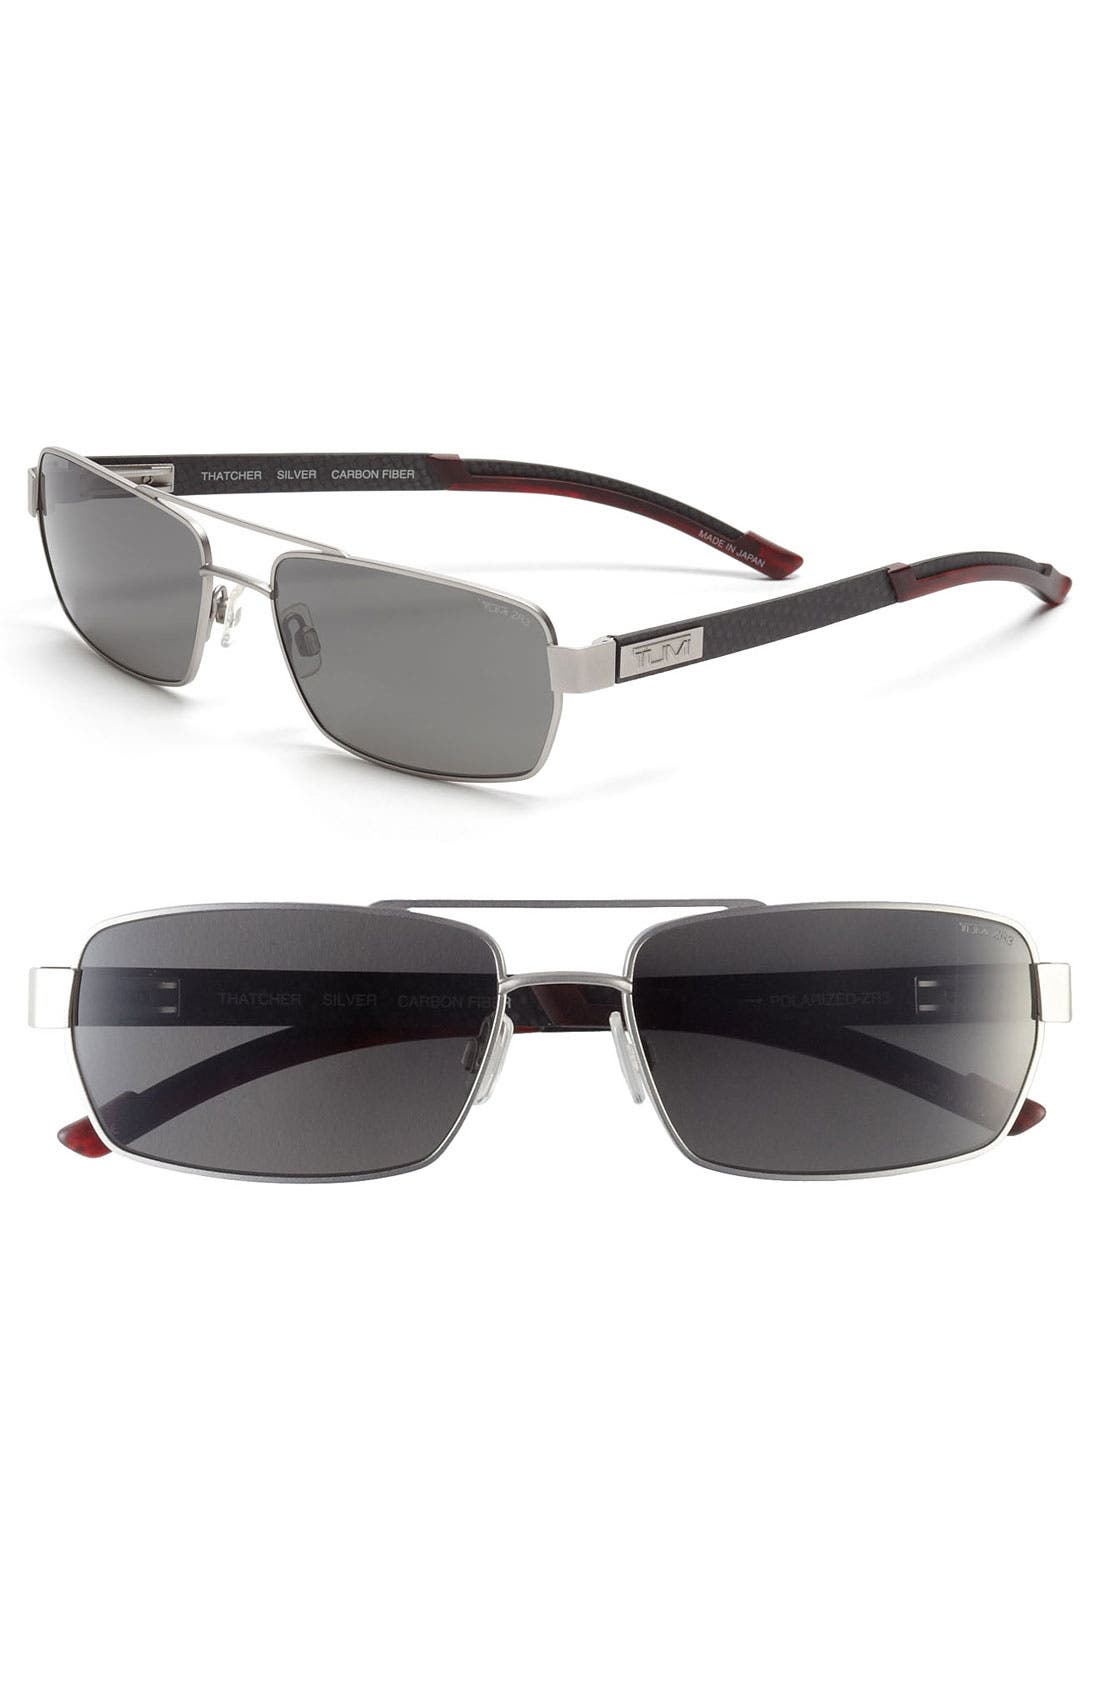 Main Image - Tumi 'Thatcher' 58mm Polarized Sunglasses